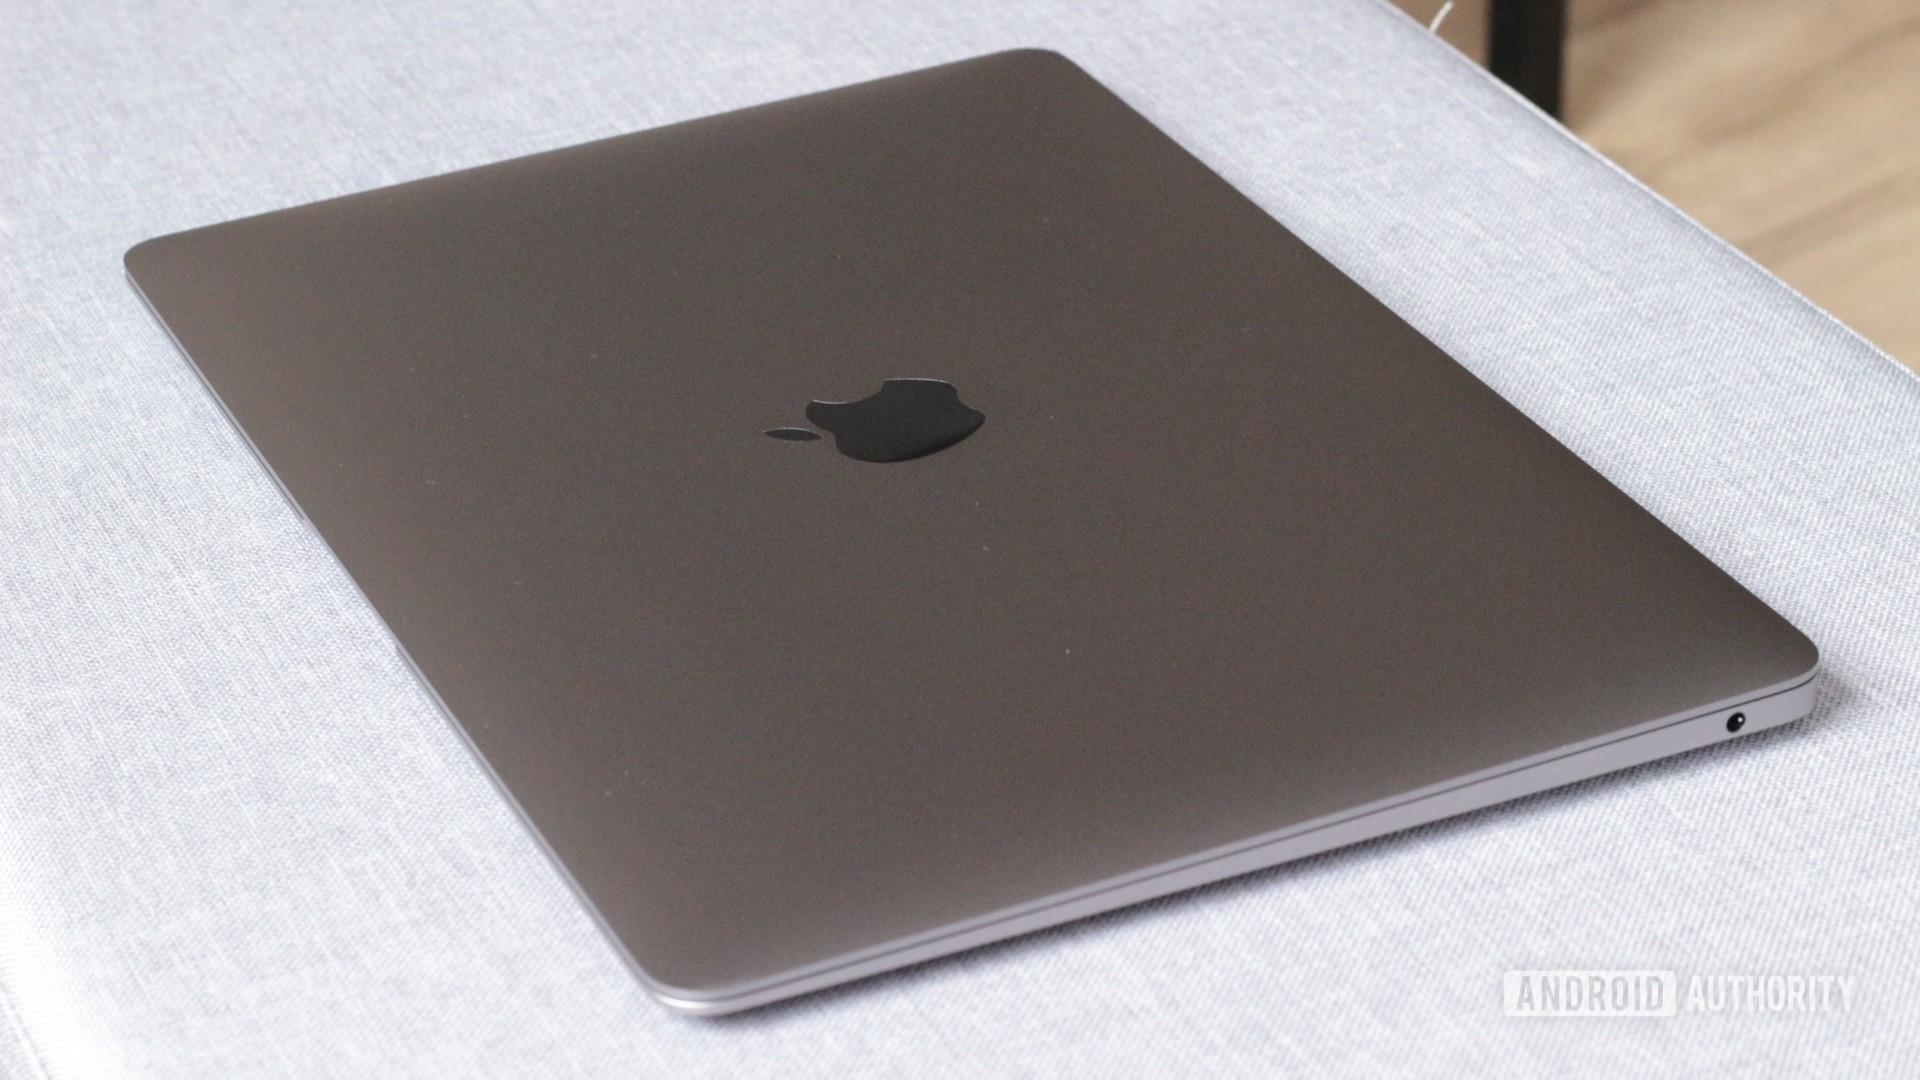 Apple MacBook Air M1 closed showing logo